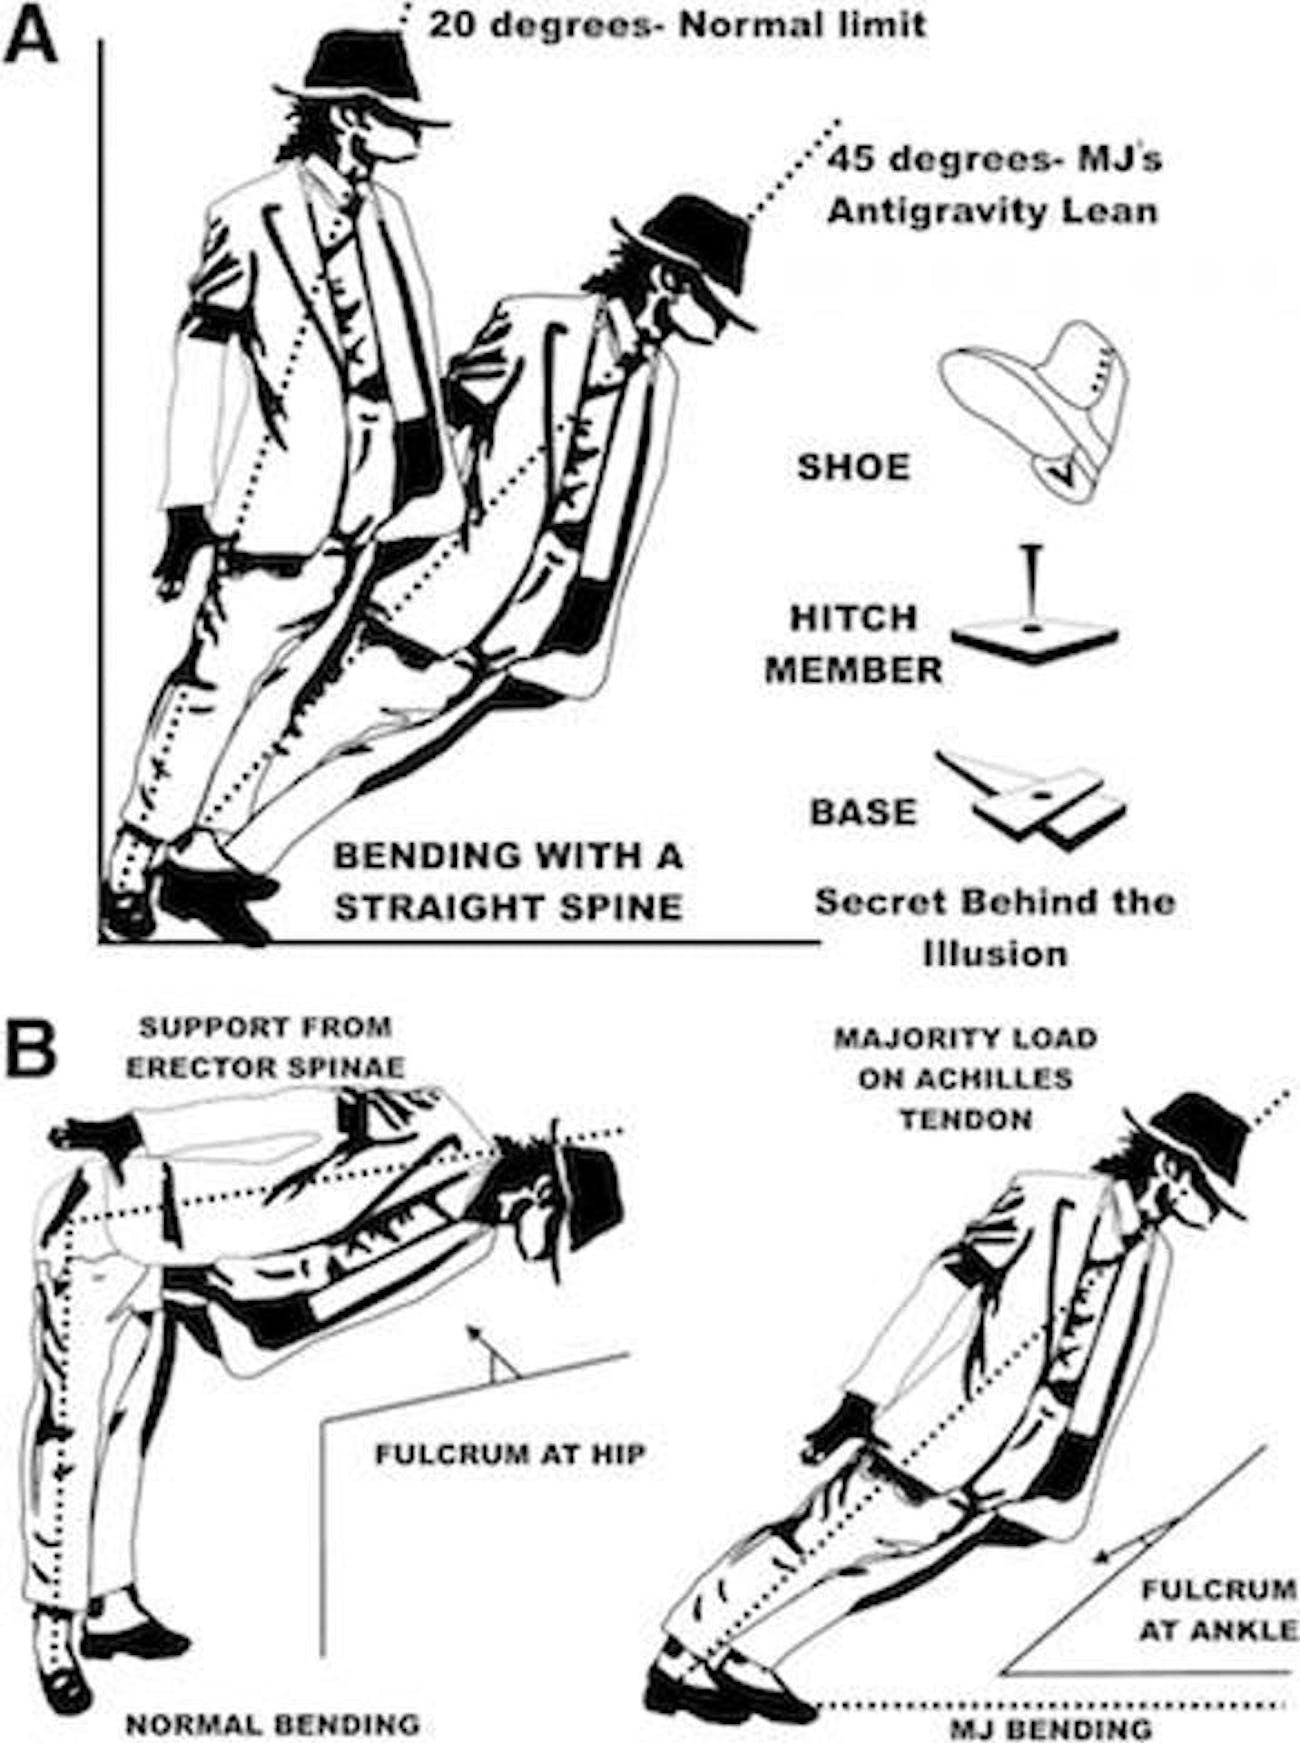 Michael Jackson's mesmerizing dance move, the anti-gravity lean.